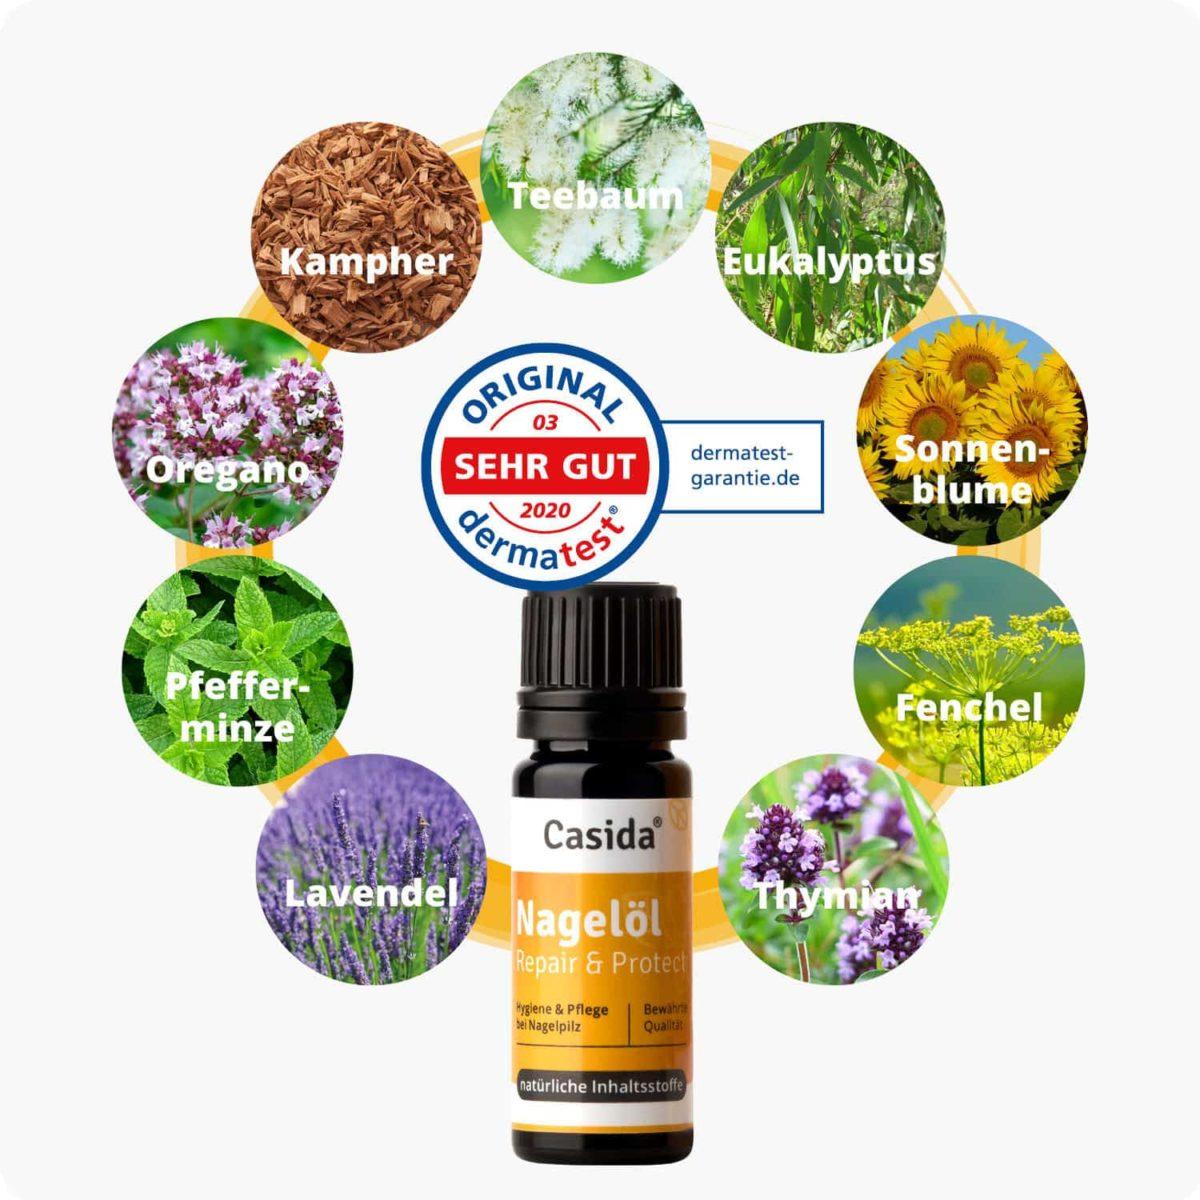 Casida Product Combo Nail Oil and Foot Bath Salt Bundle PZN 10022445 12907018 Nagelpilz bekämpfen pflanzlich Fußpilz3